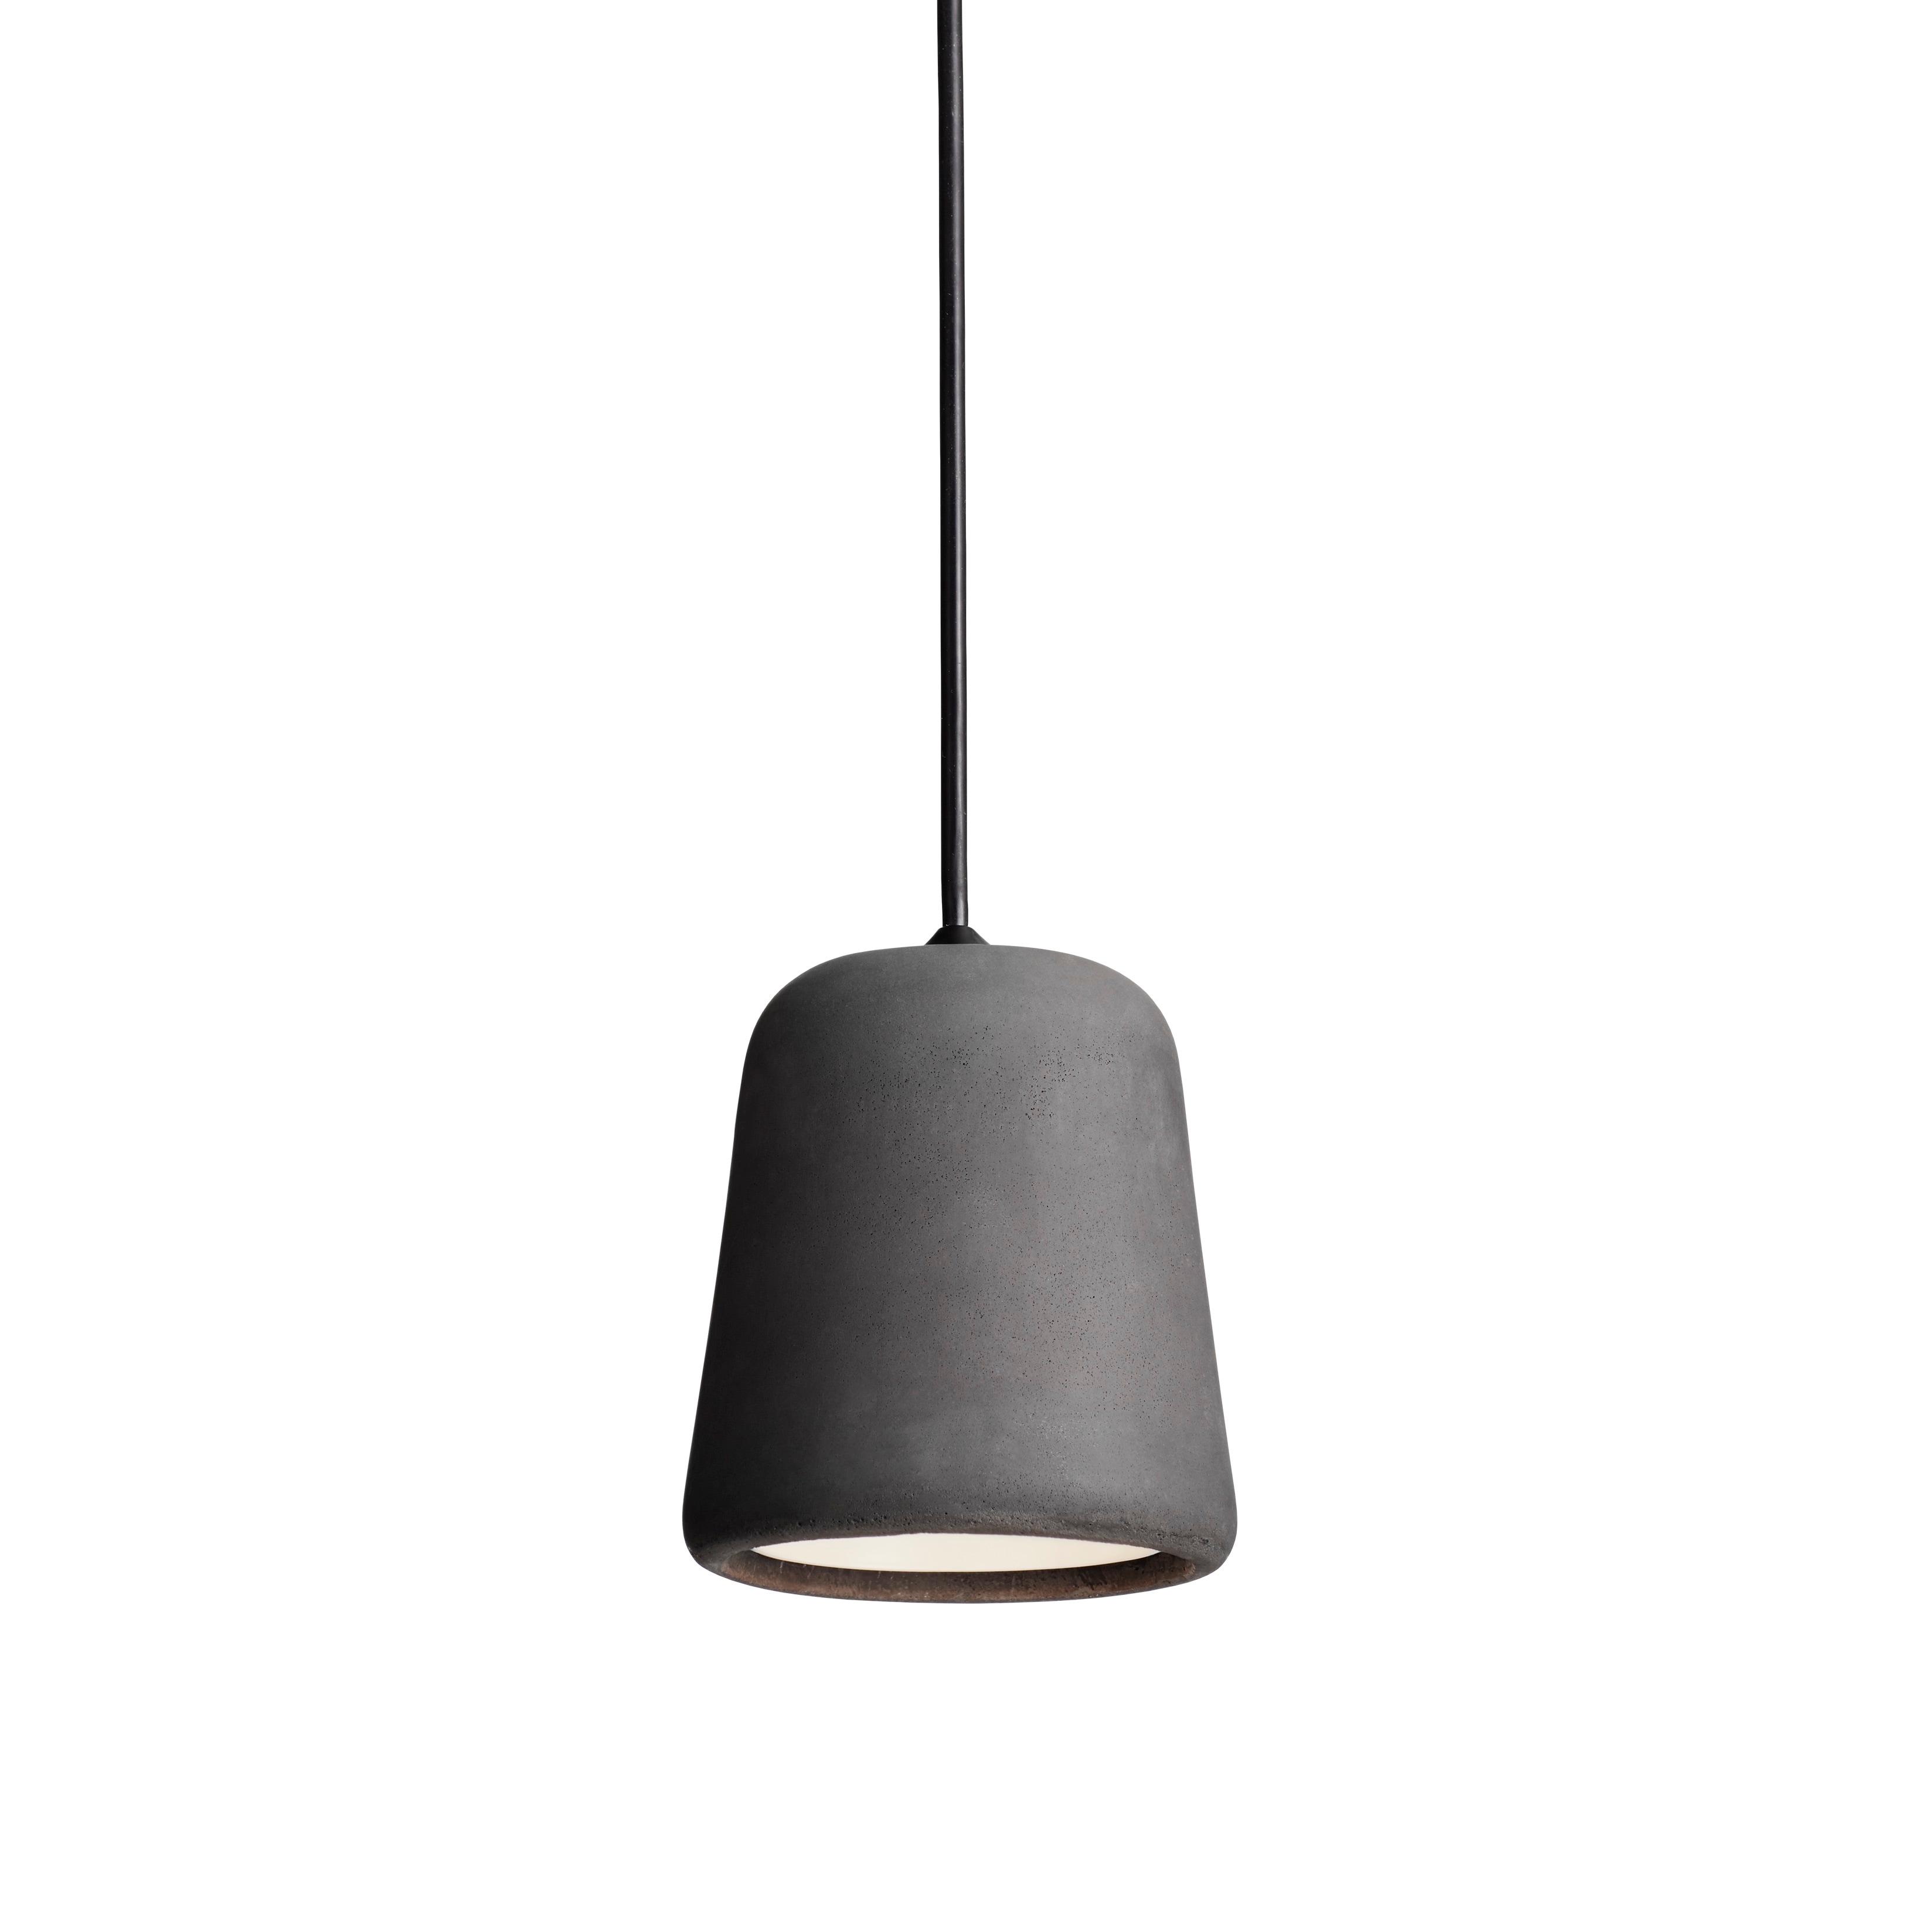 Material taklampa mörkgrå betong/svart